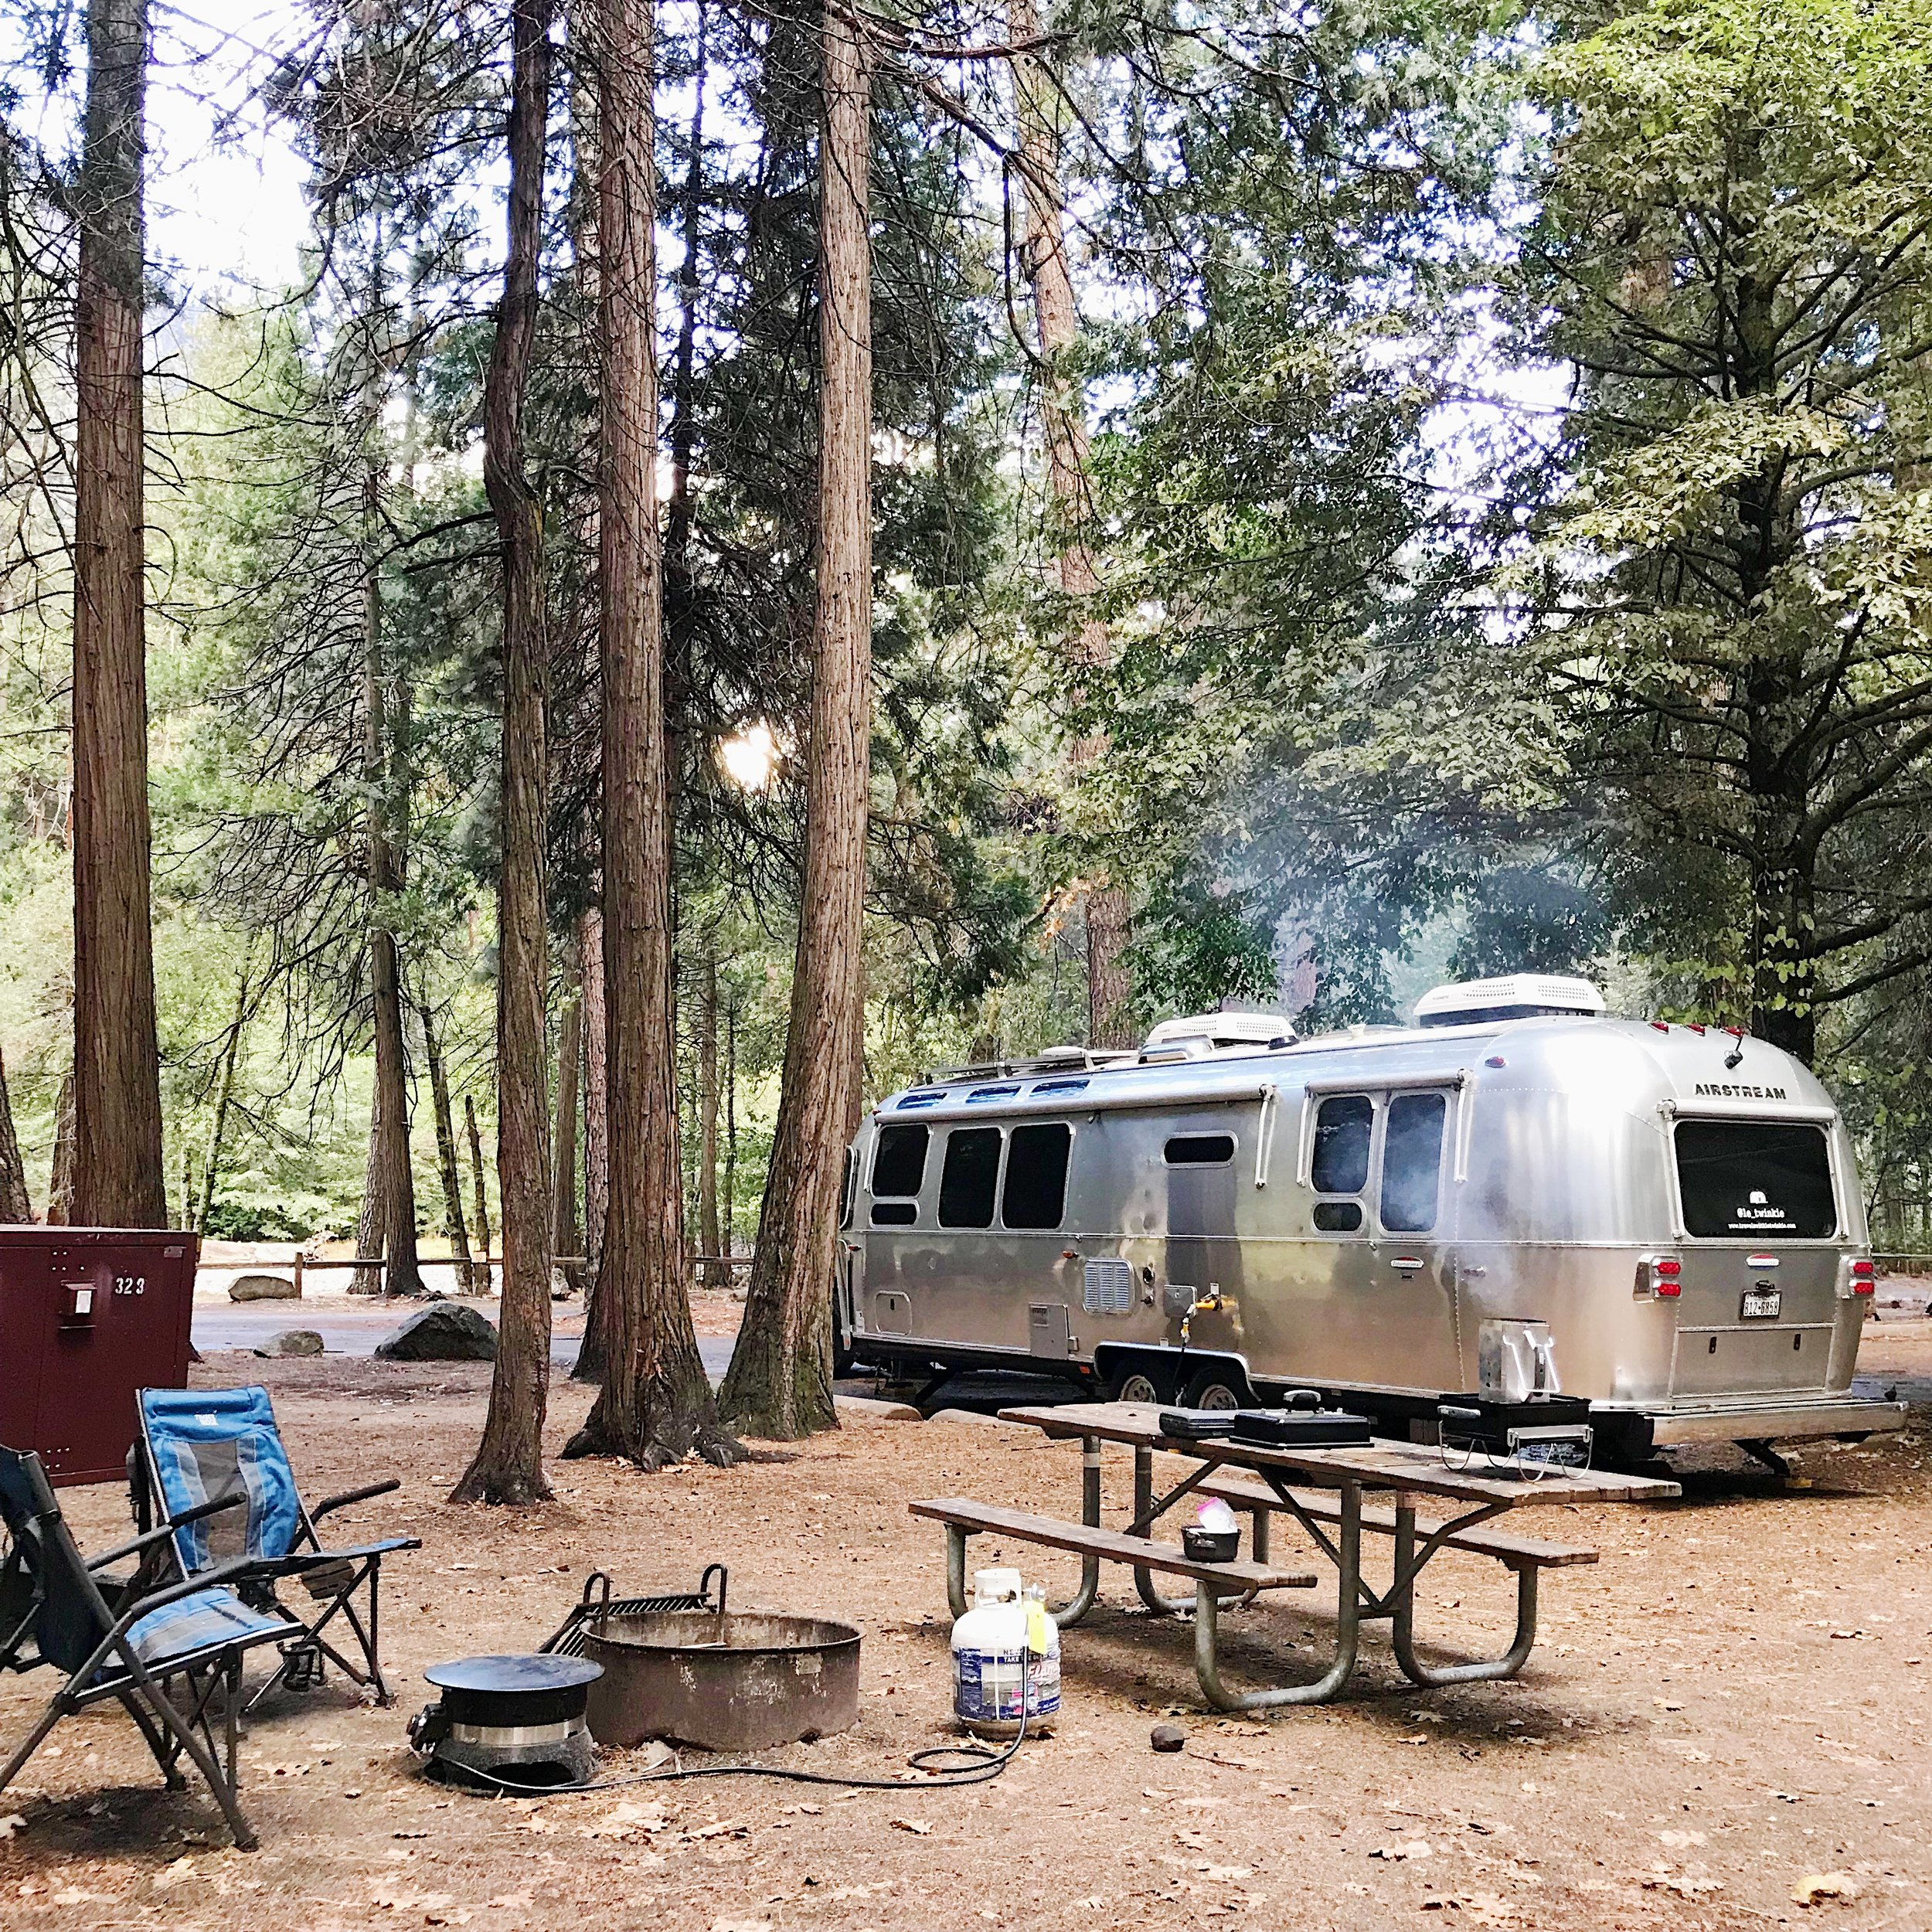 CampfirePit.JPG